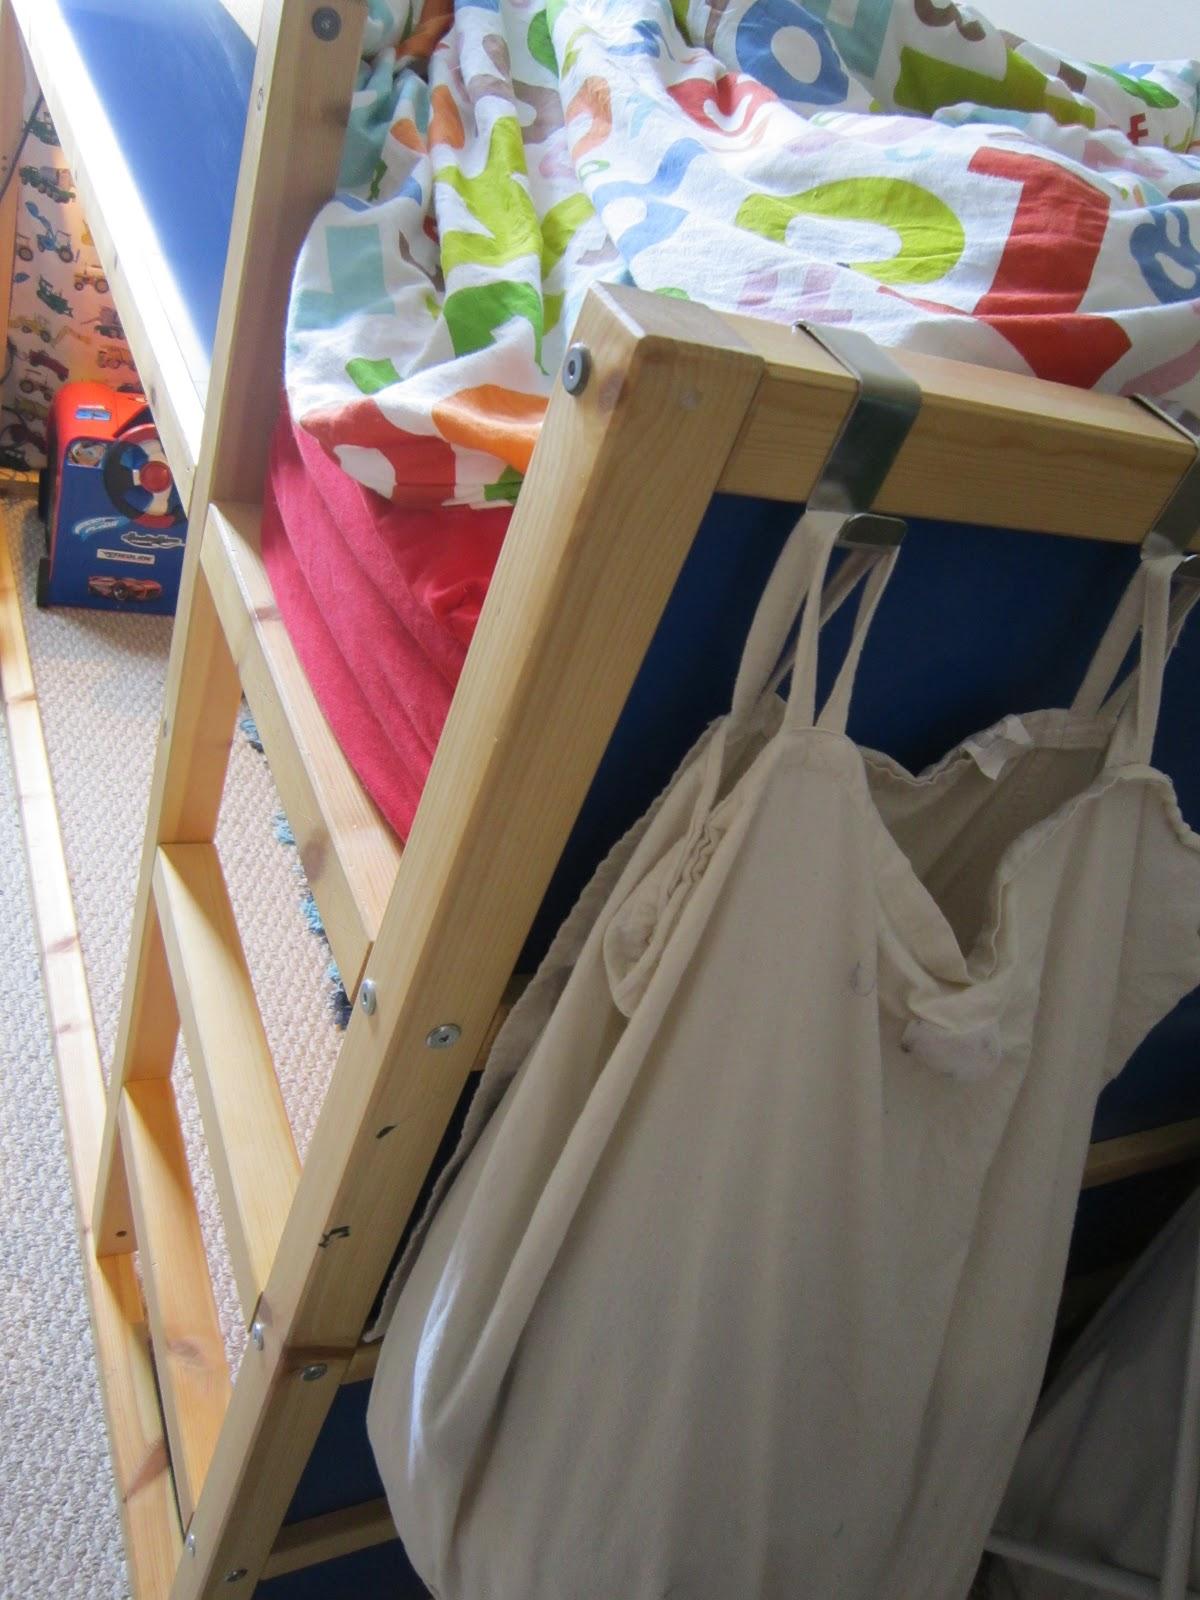 Loft bed curtains dorm - Kids Children Handmade Diy Curtains For Our New Kura Loft Bed